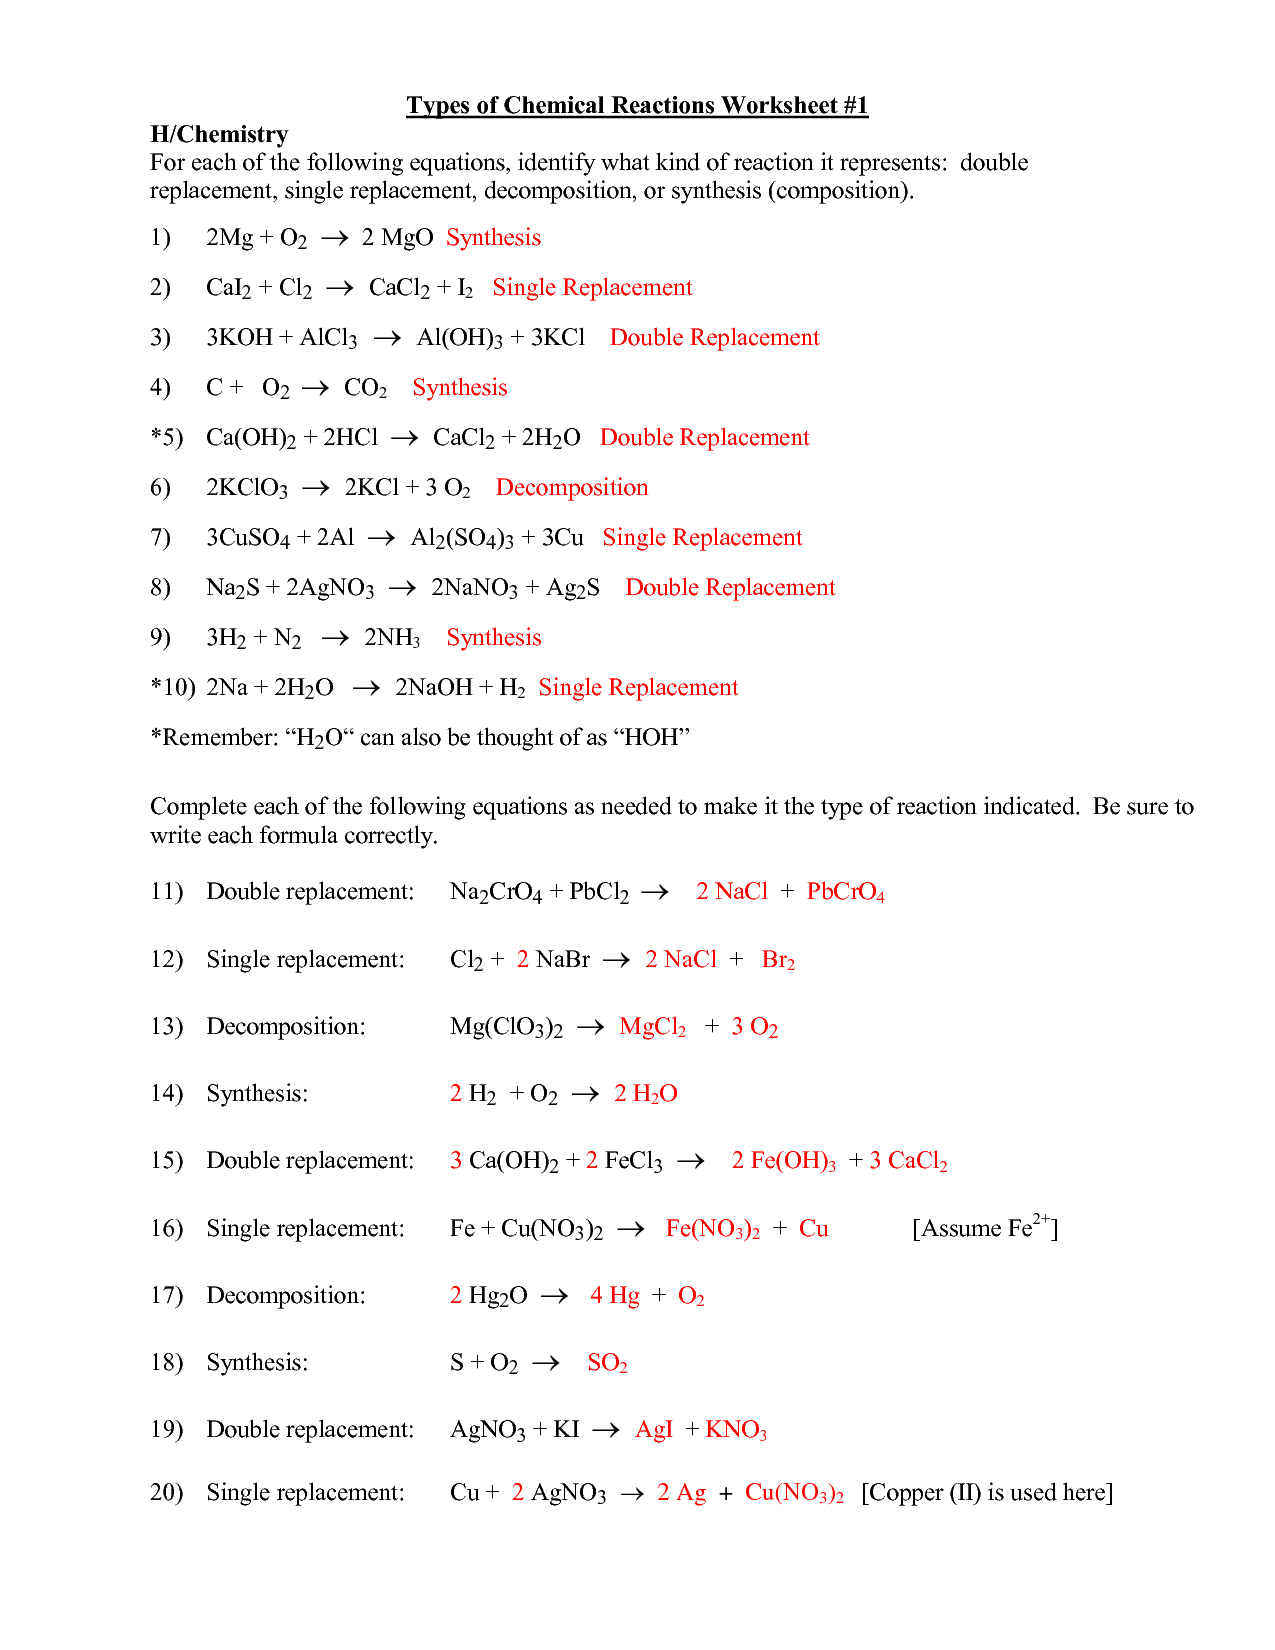 Single Replacement Reaction Worksheet 720160